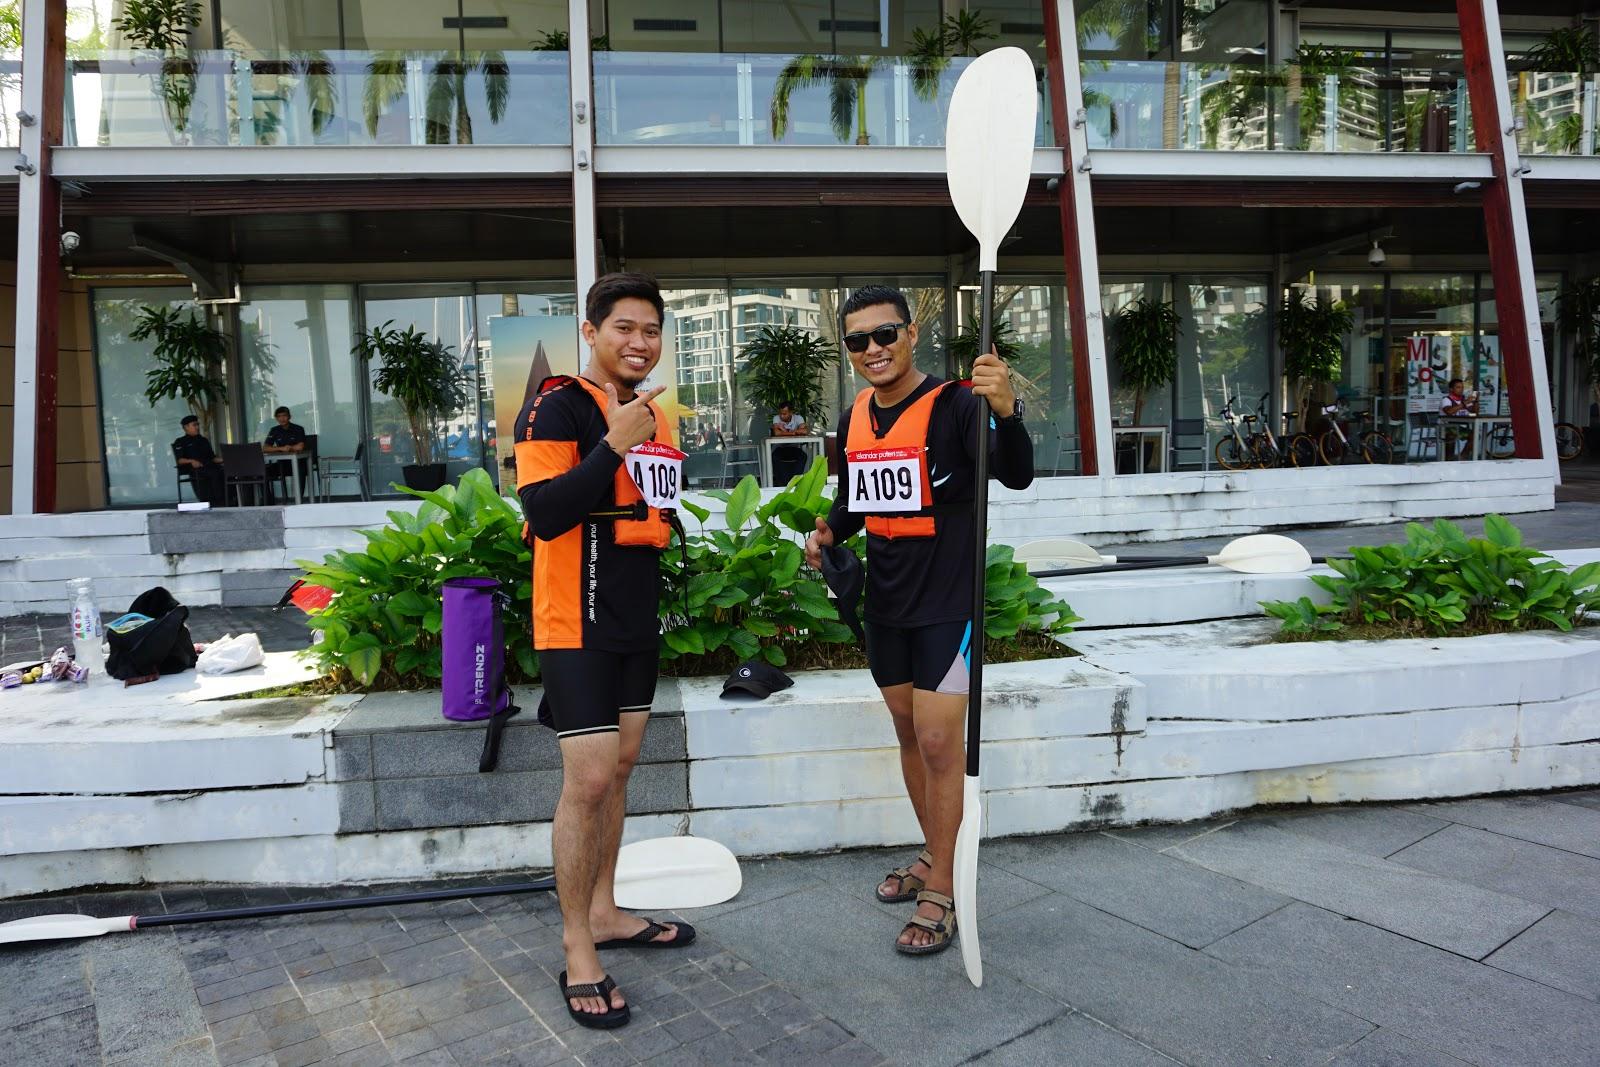 MALAYSIA TOURISM COUNCIL (MTC)